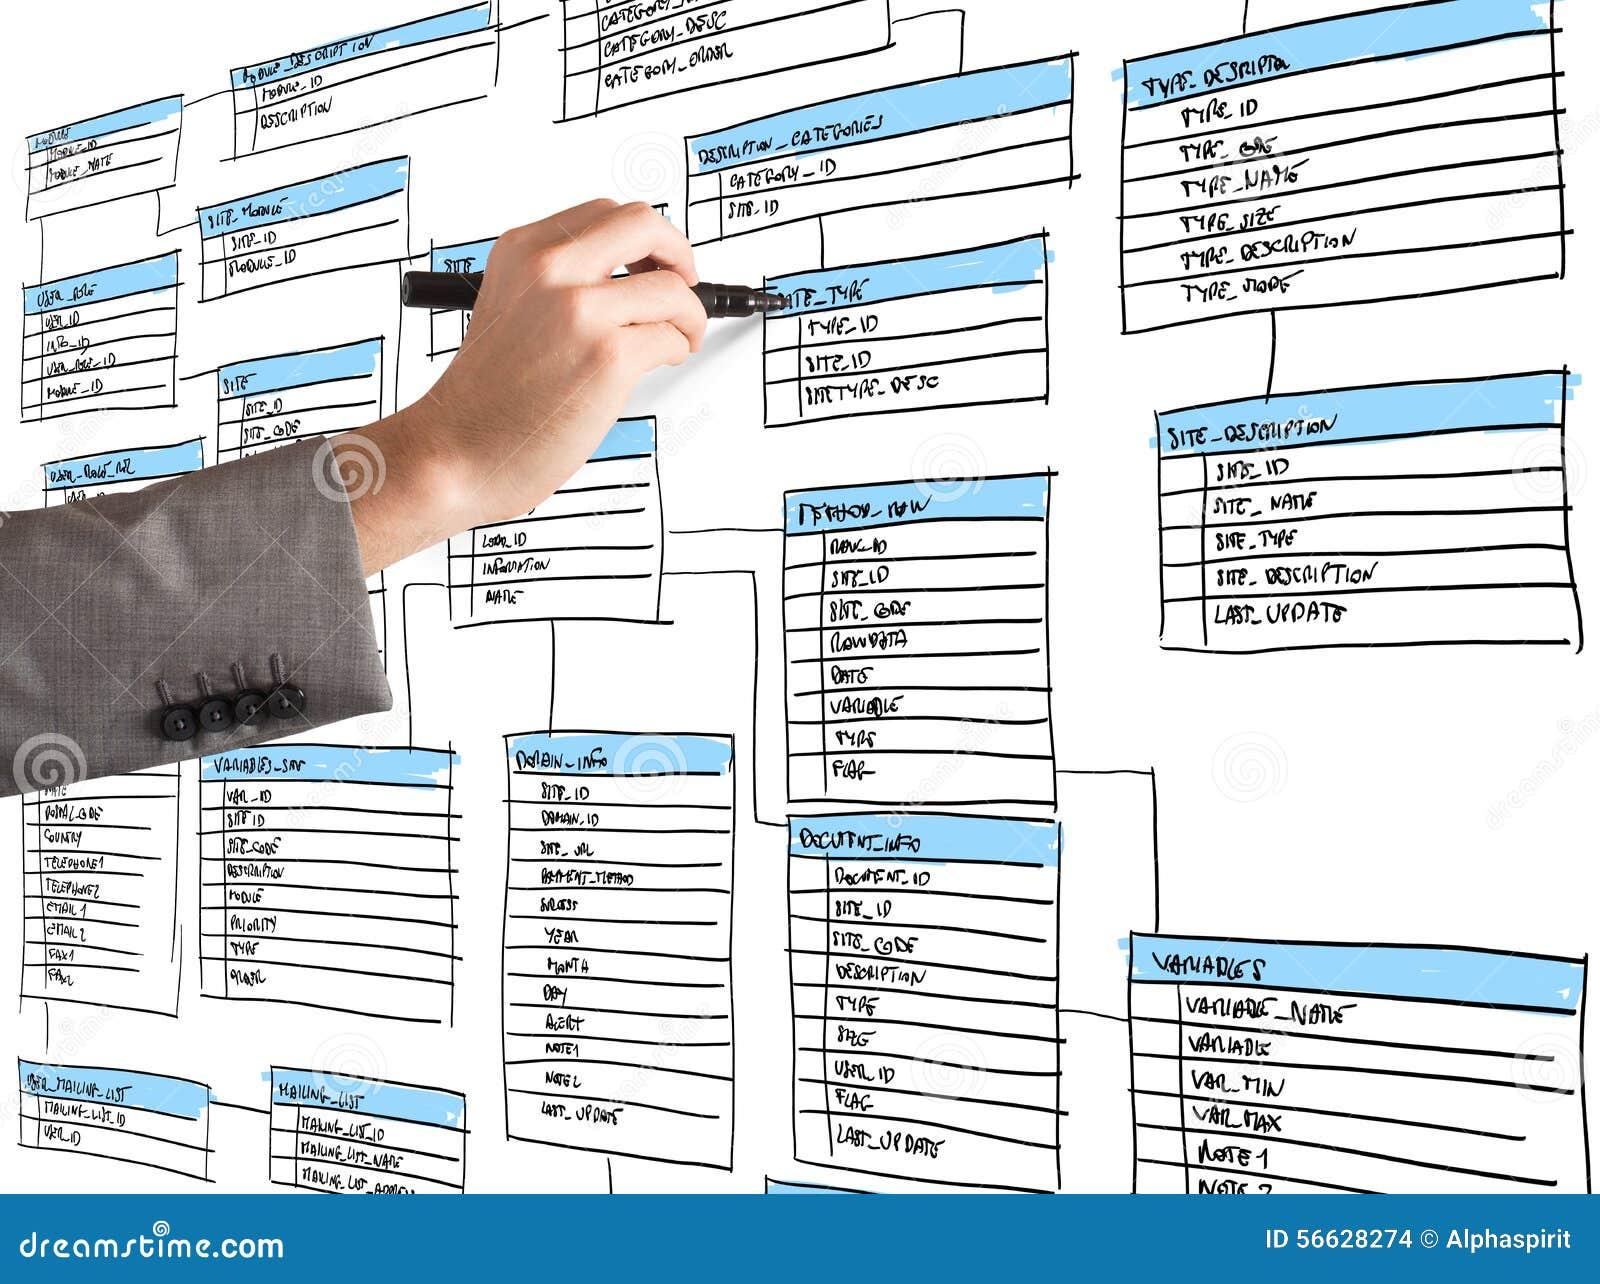 Organize a database